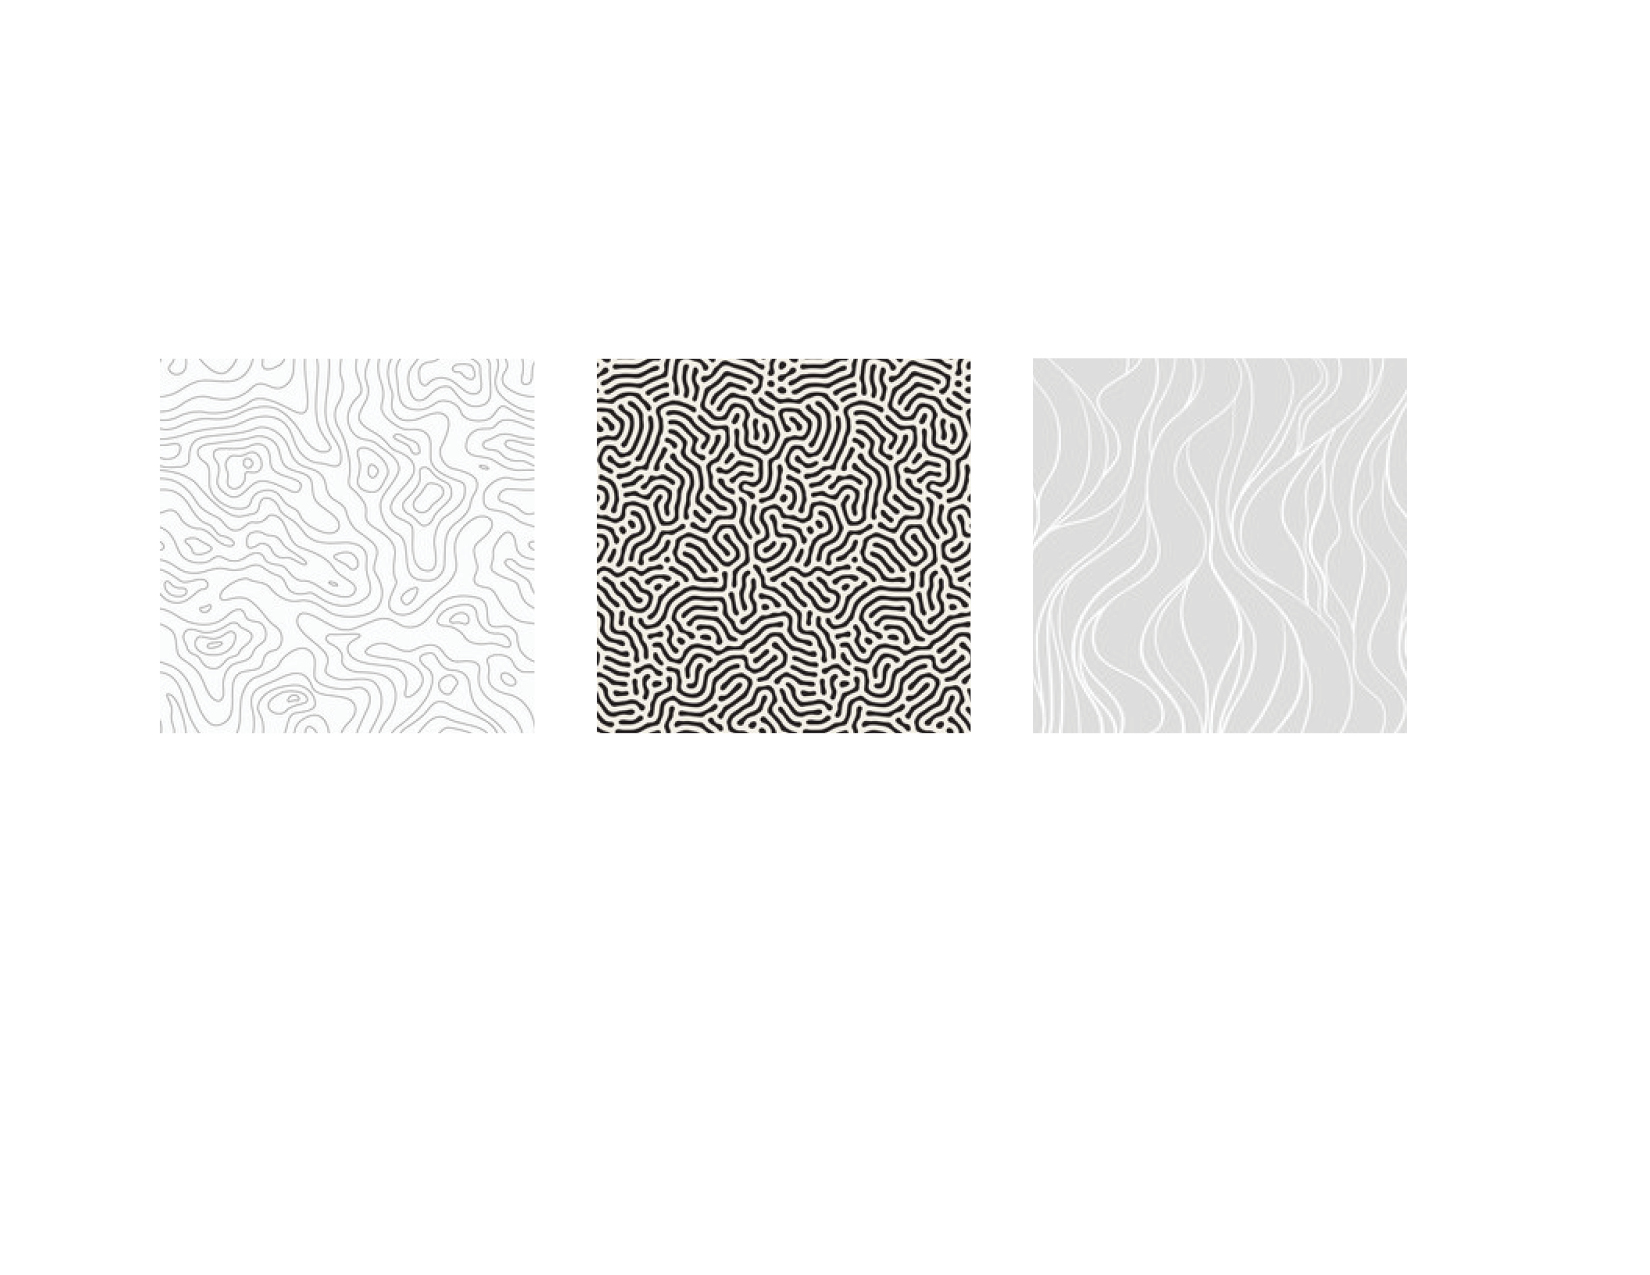 BOC-visual_identity10.jpg